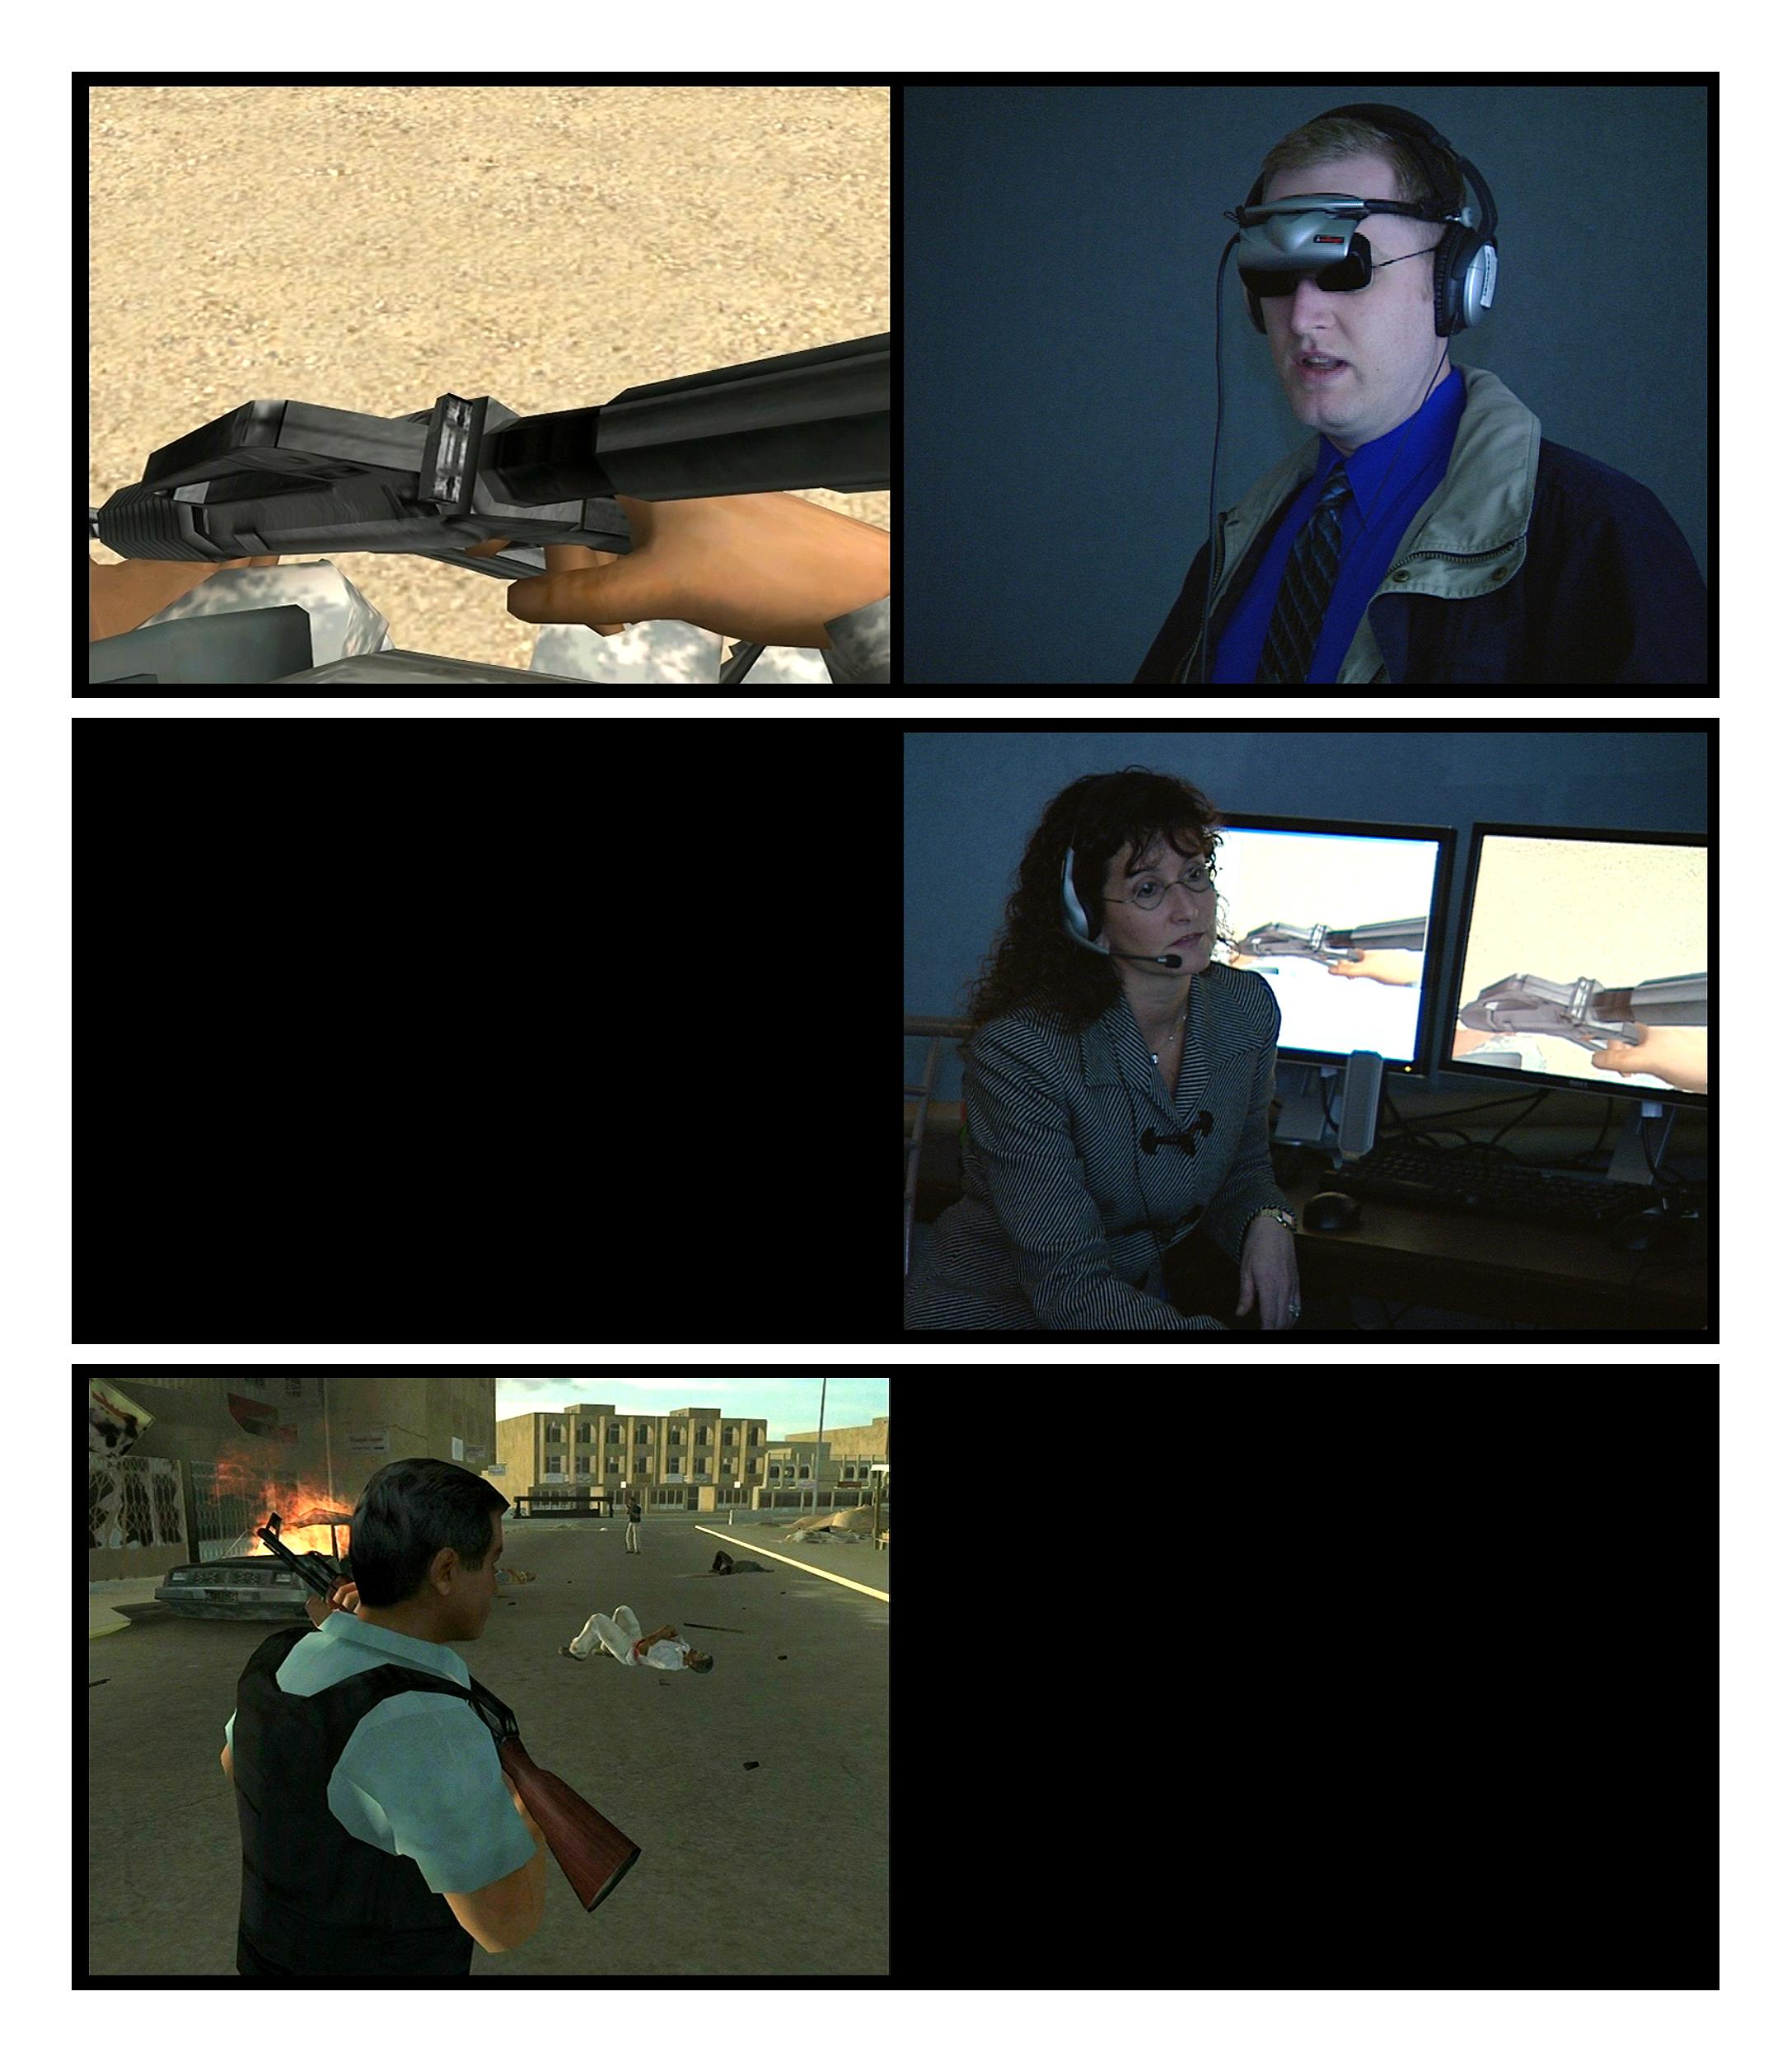 Serious Games III: Immersion (stills), 2009